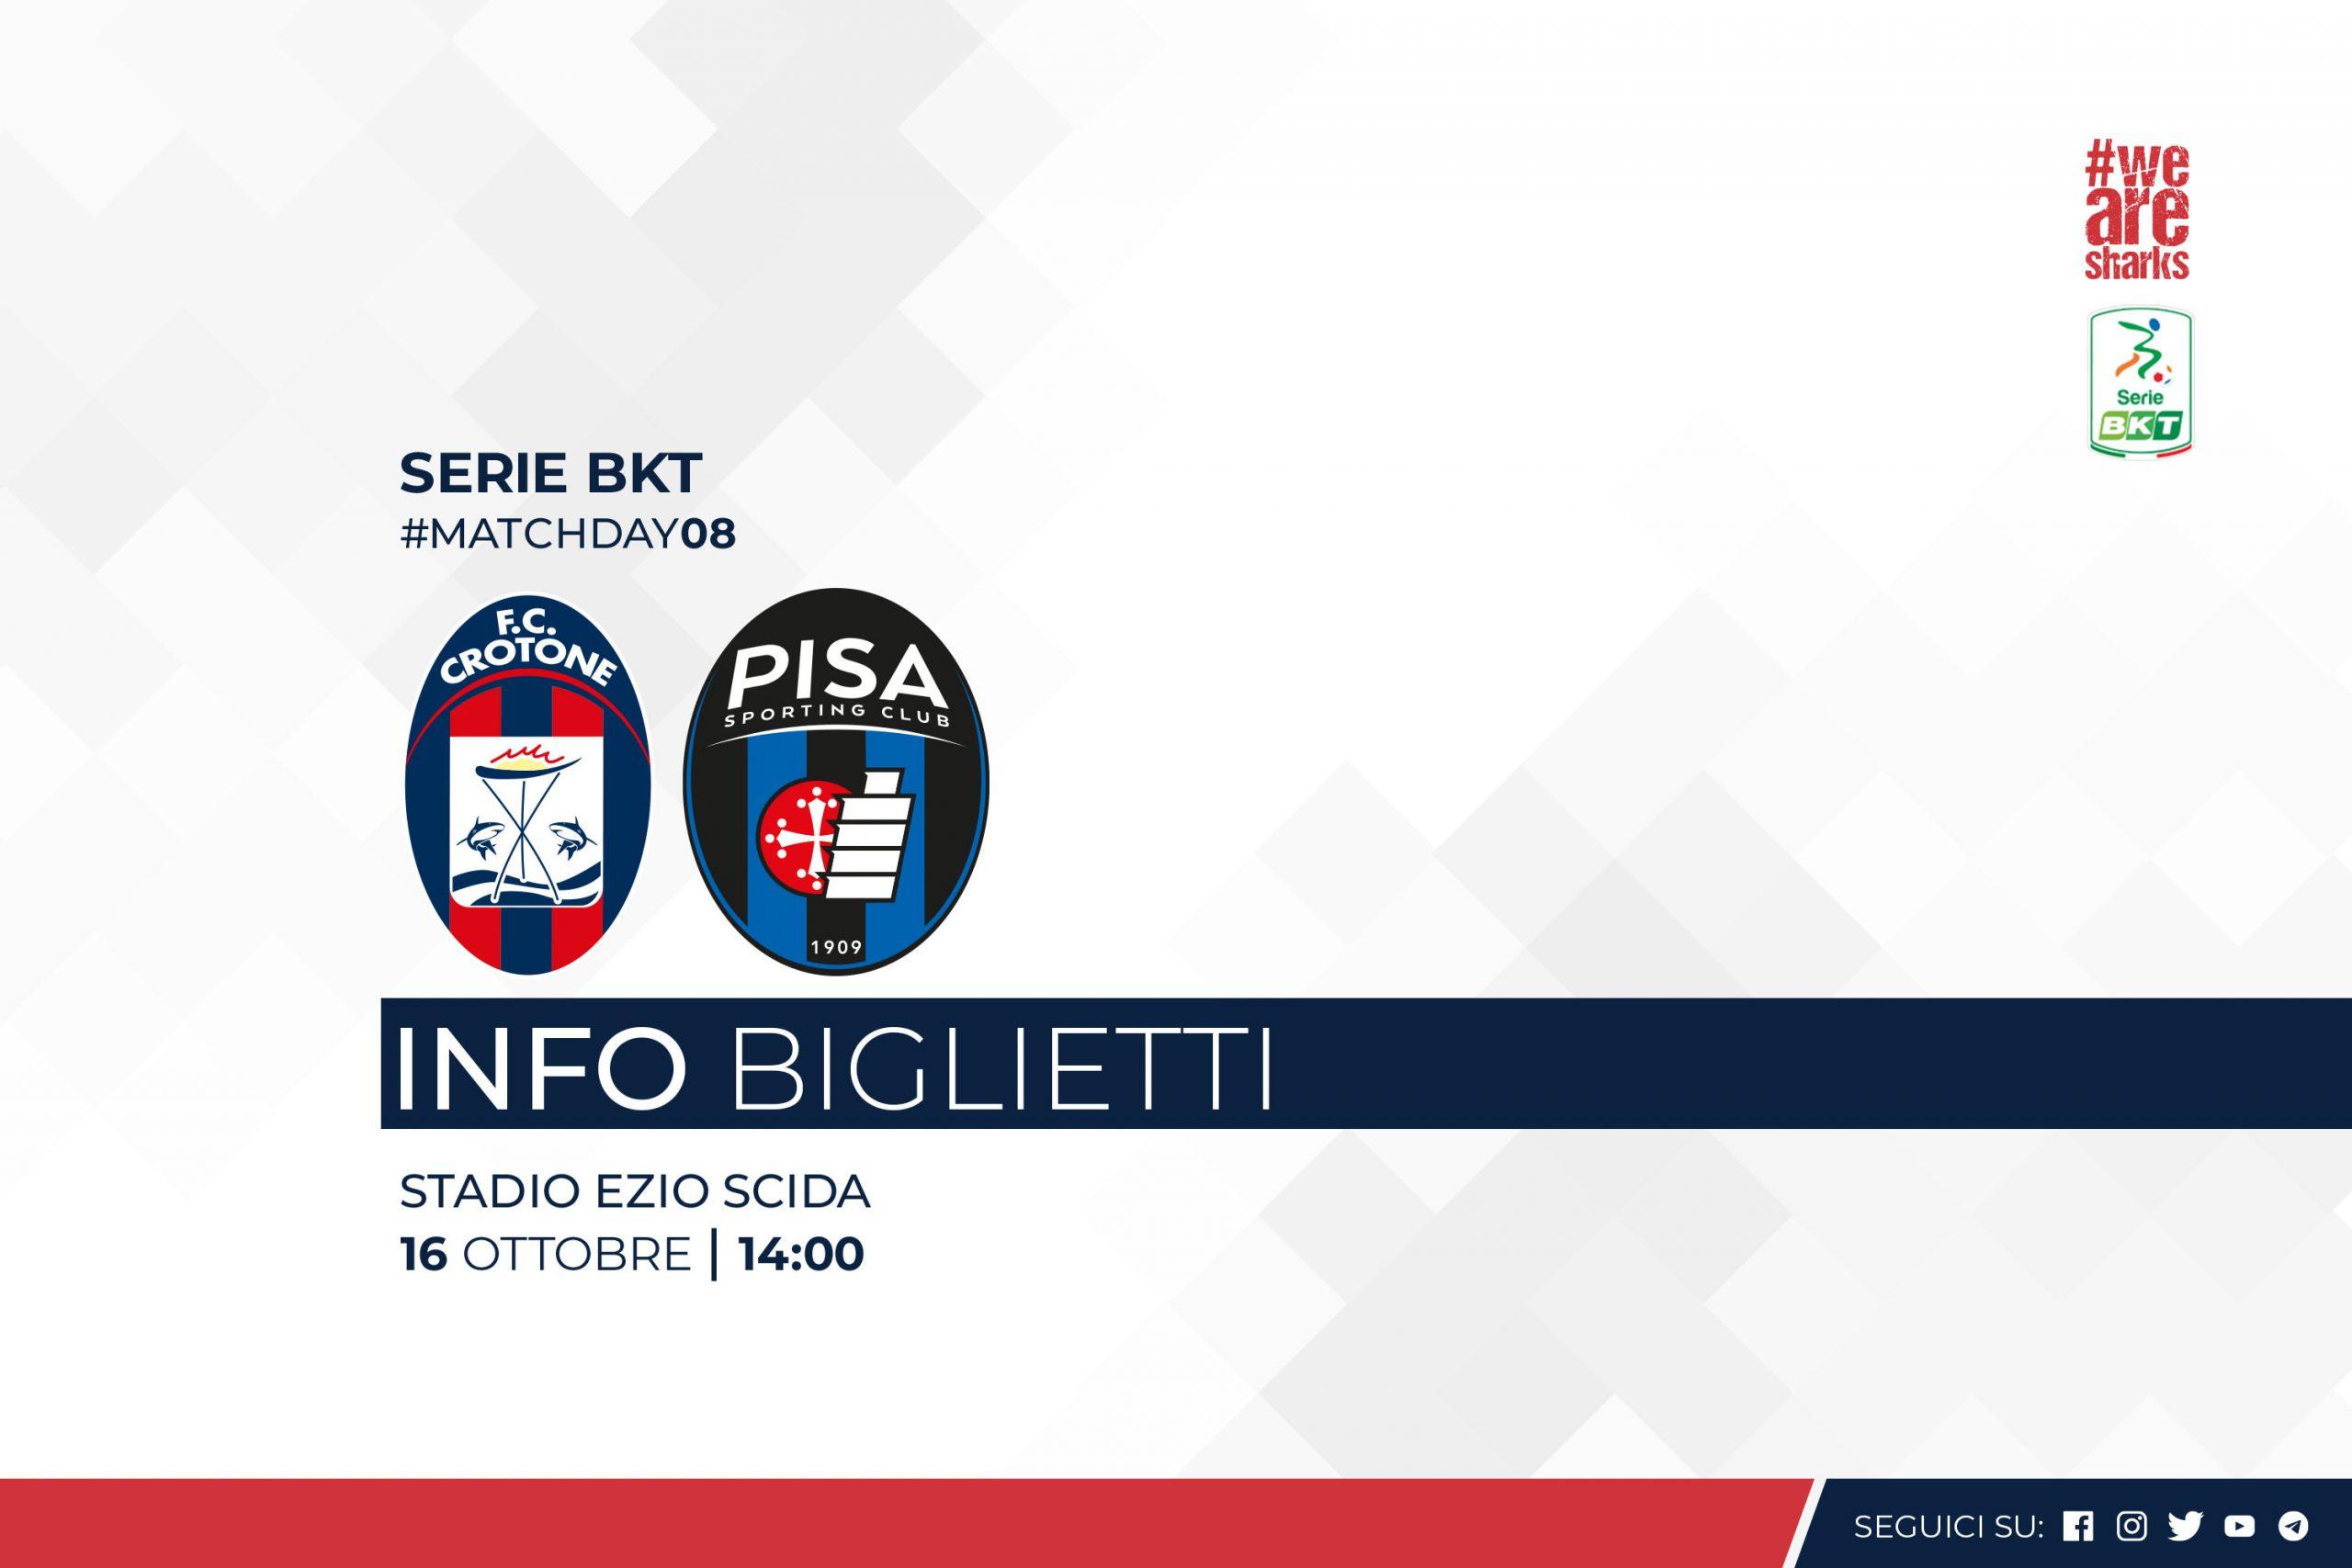 8ª giornata Serie BKT, #CrotonePisa: info biglietti